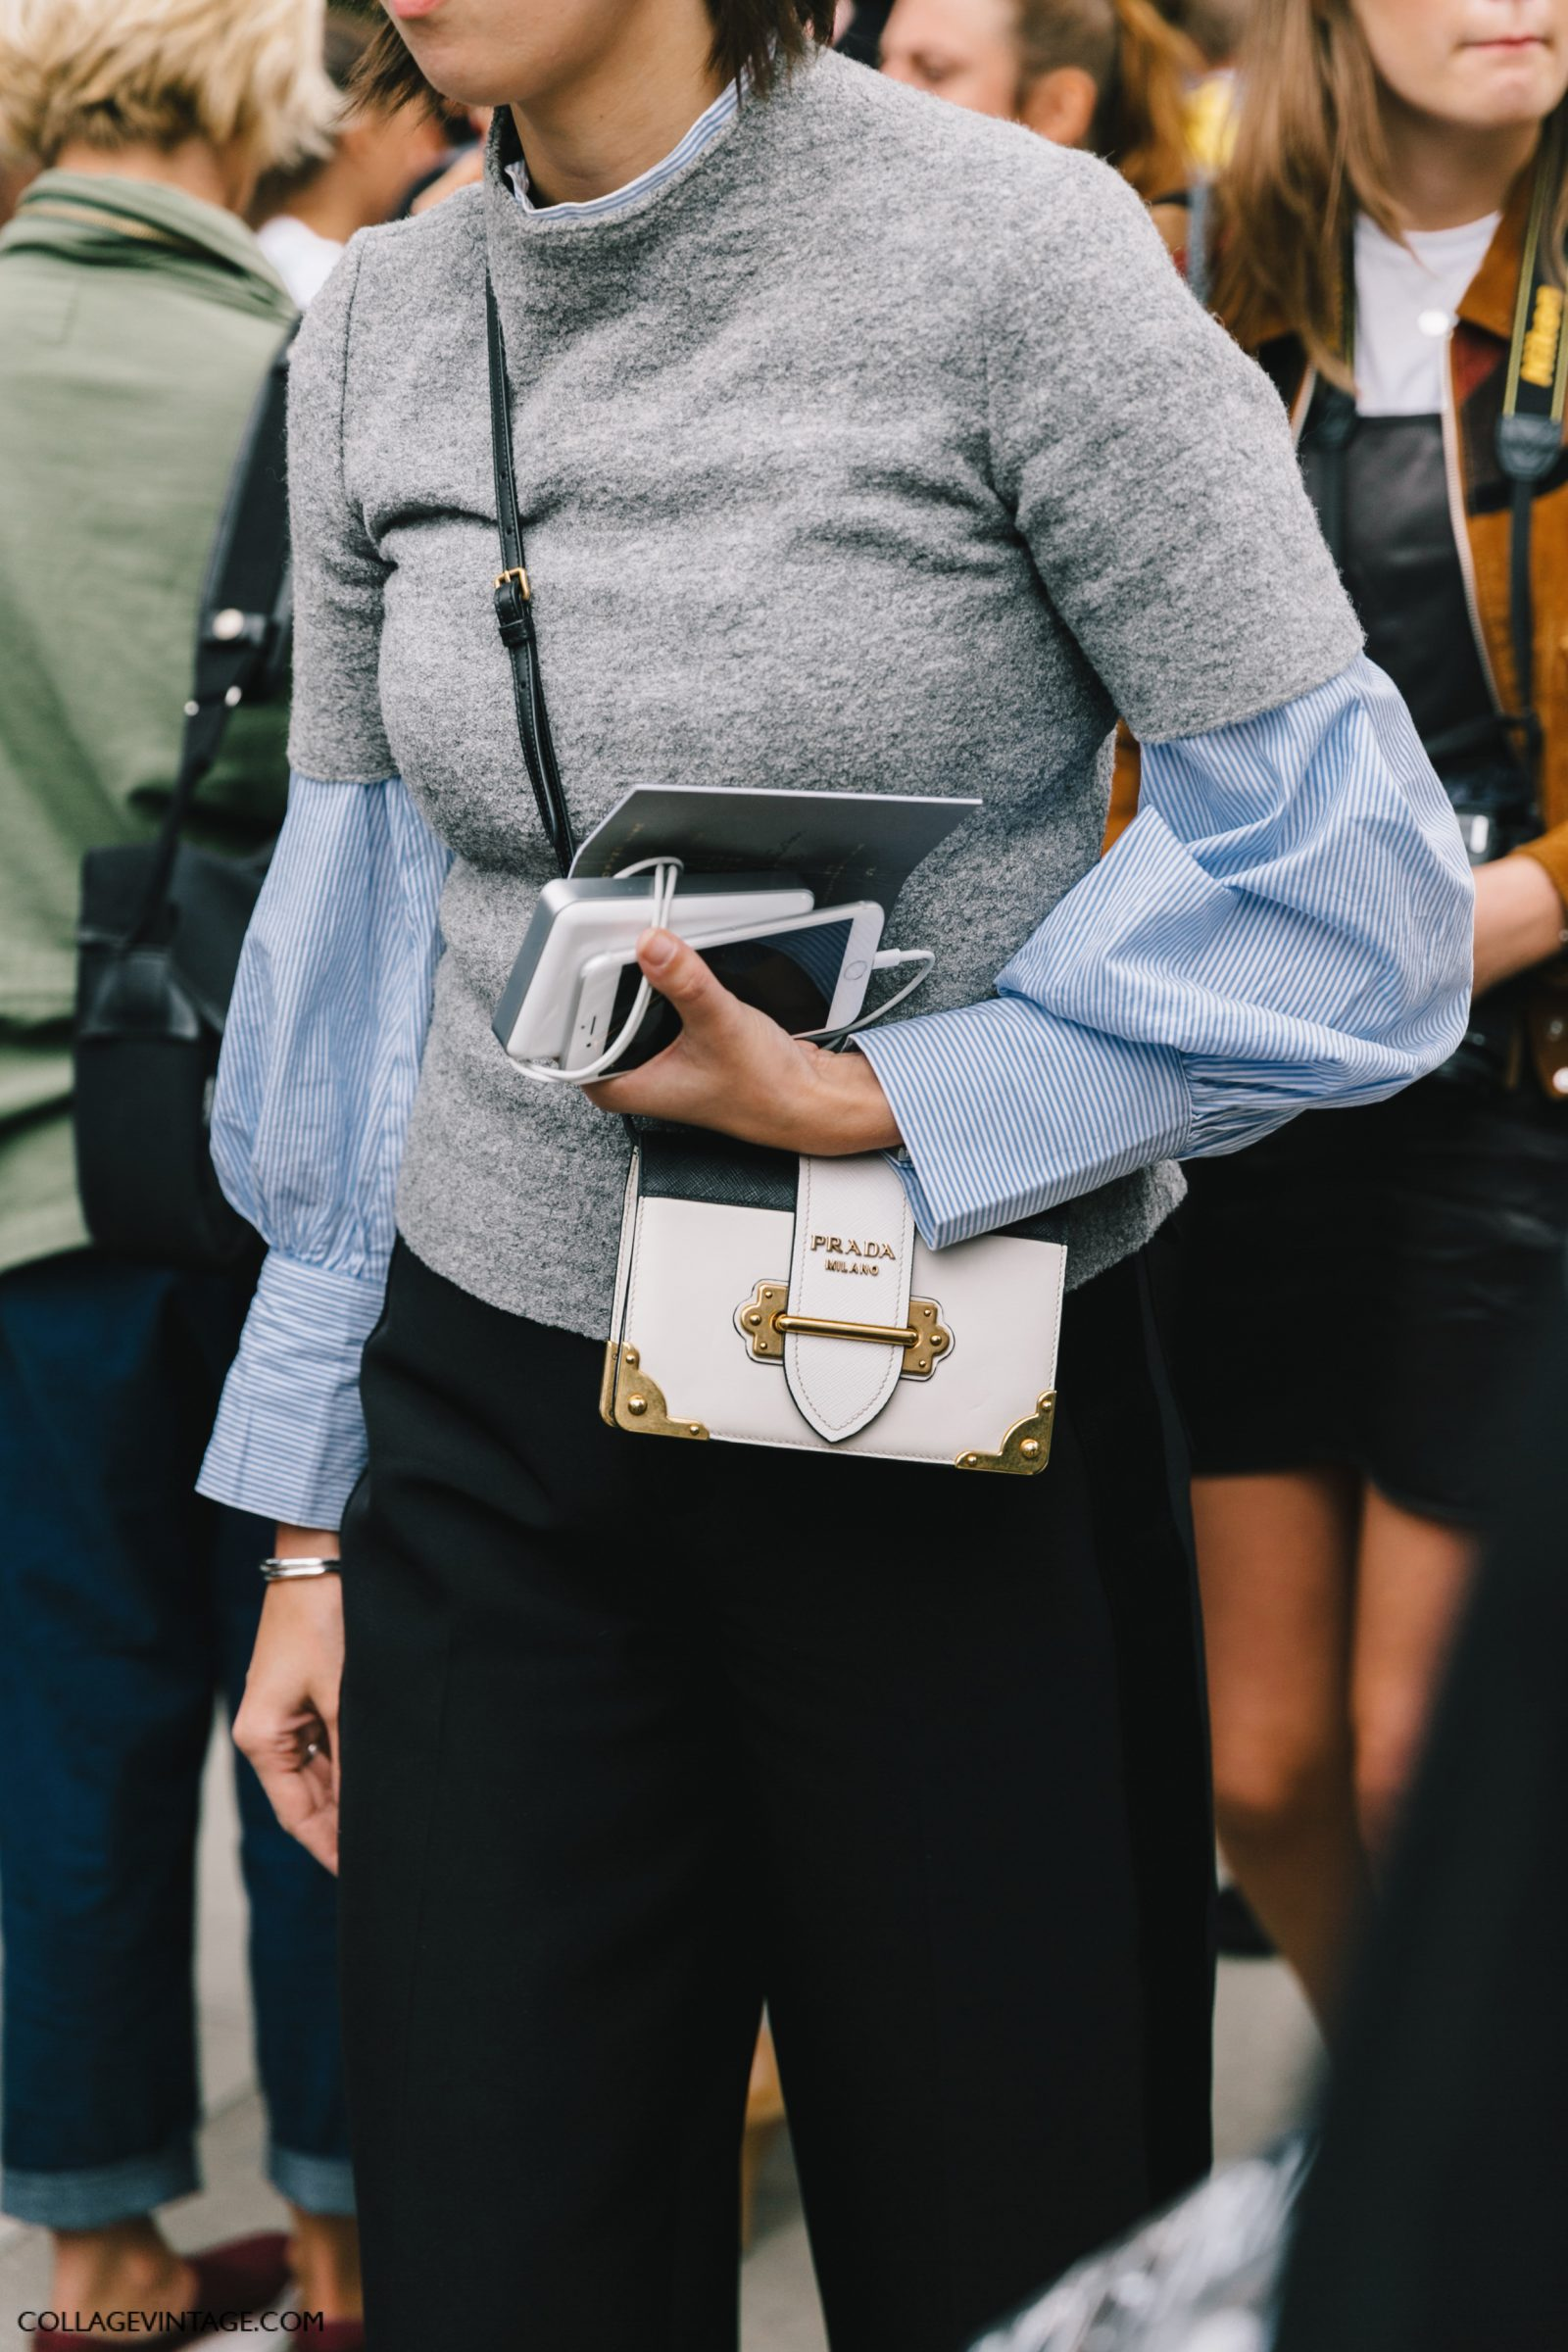 lfw-london_fashion_week_ss17-street_style-outfits-collage_vintage-vintage-roksanda-christopher_kane-joseph-111